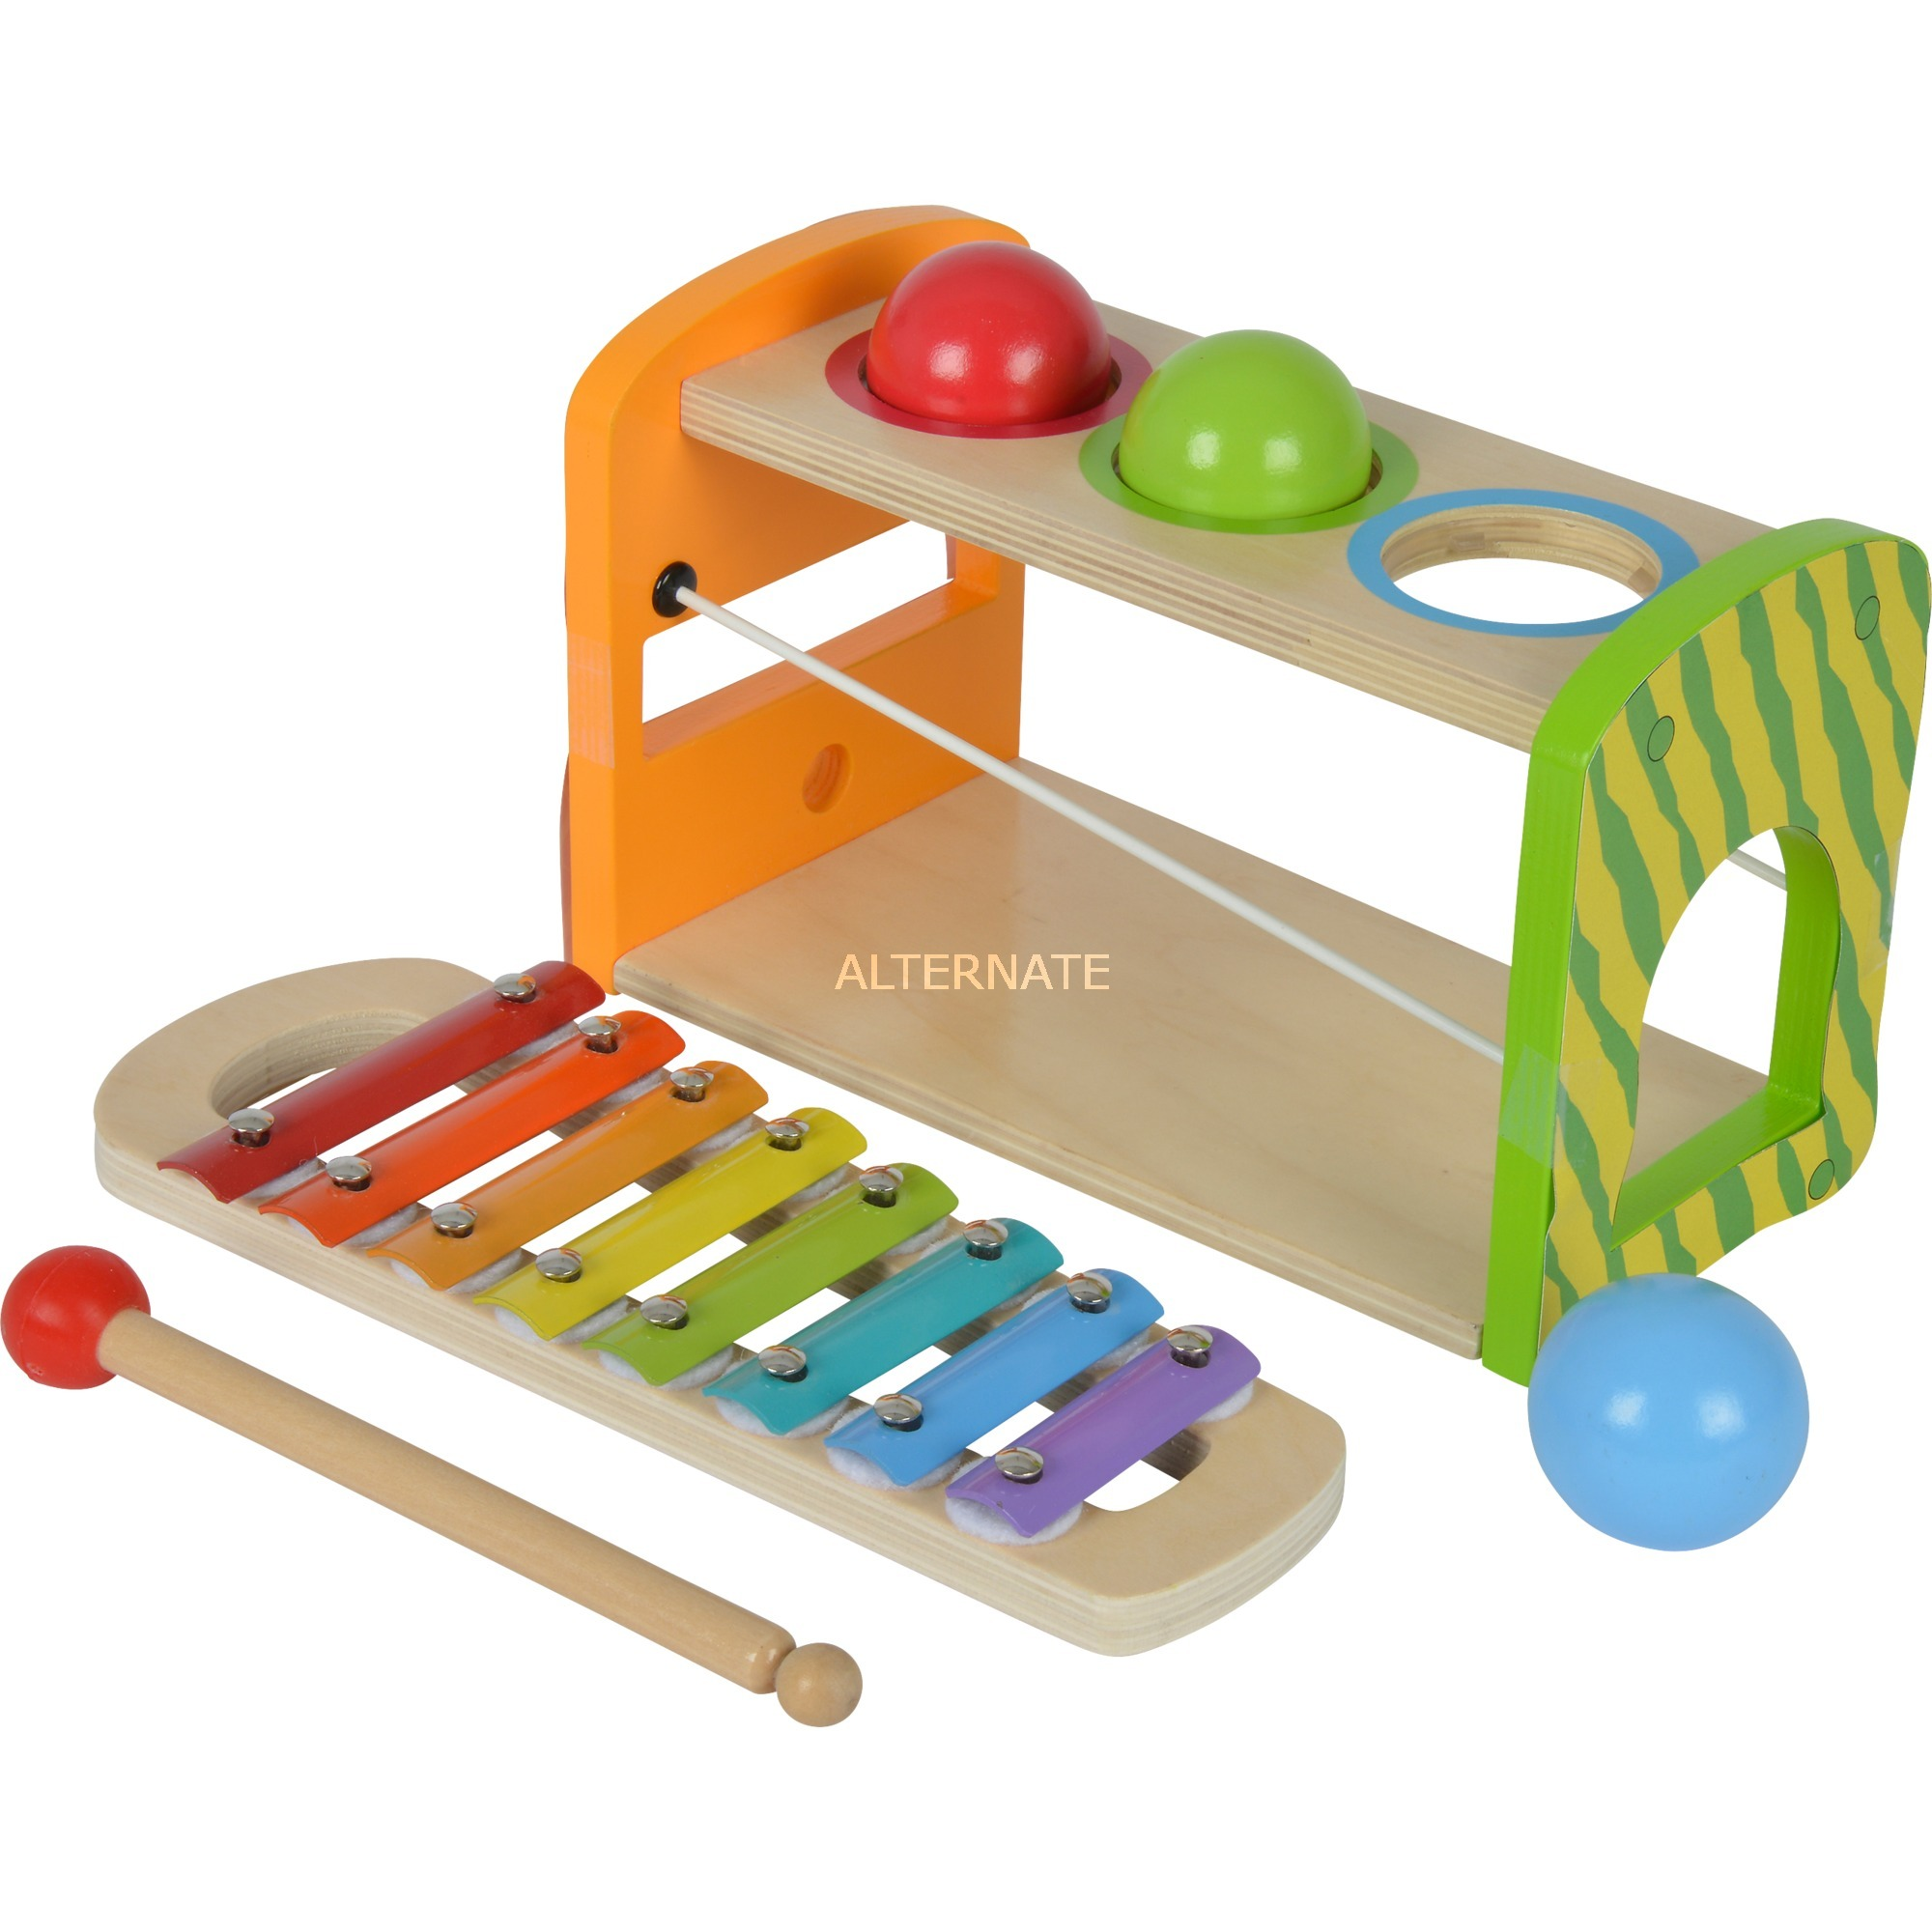 100002233, Instrumentos musicales